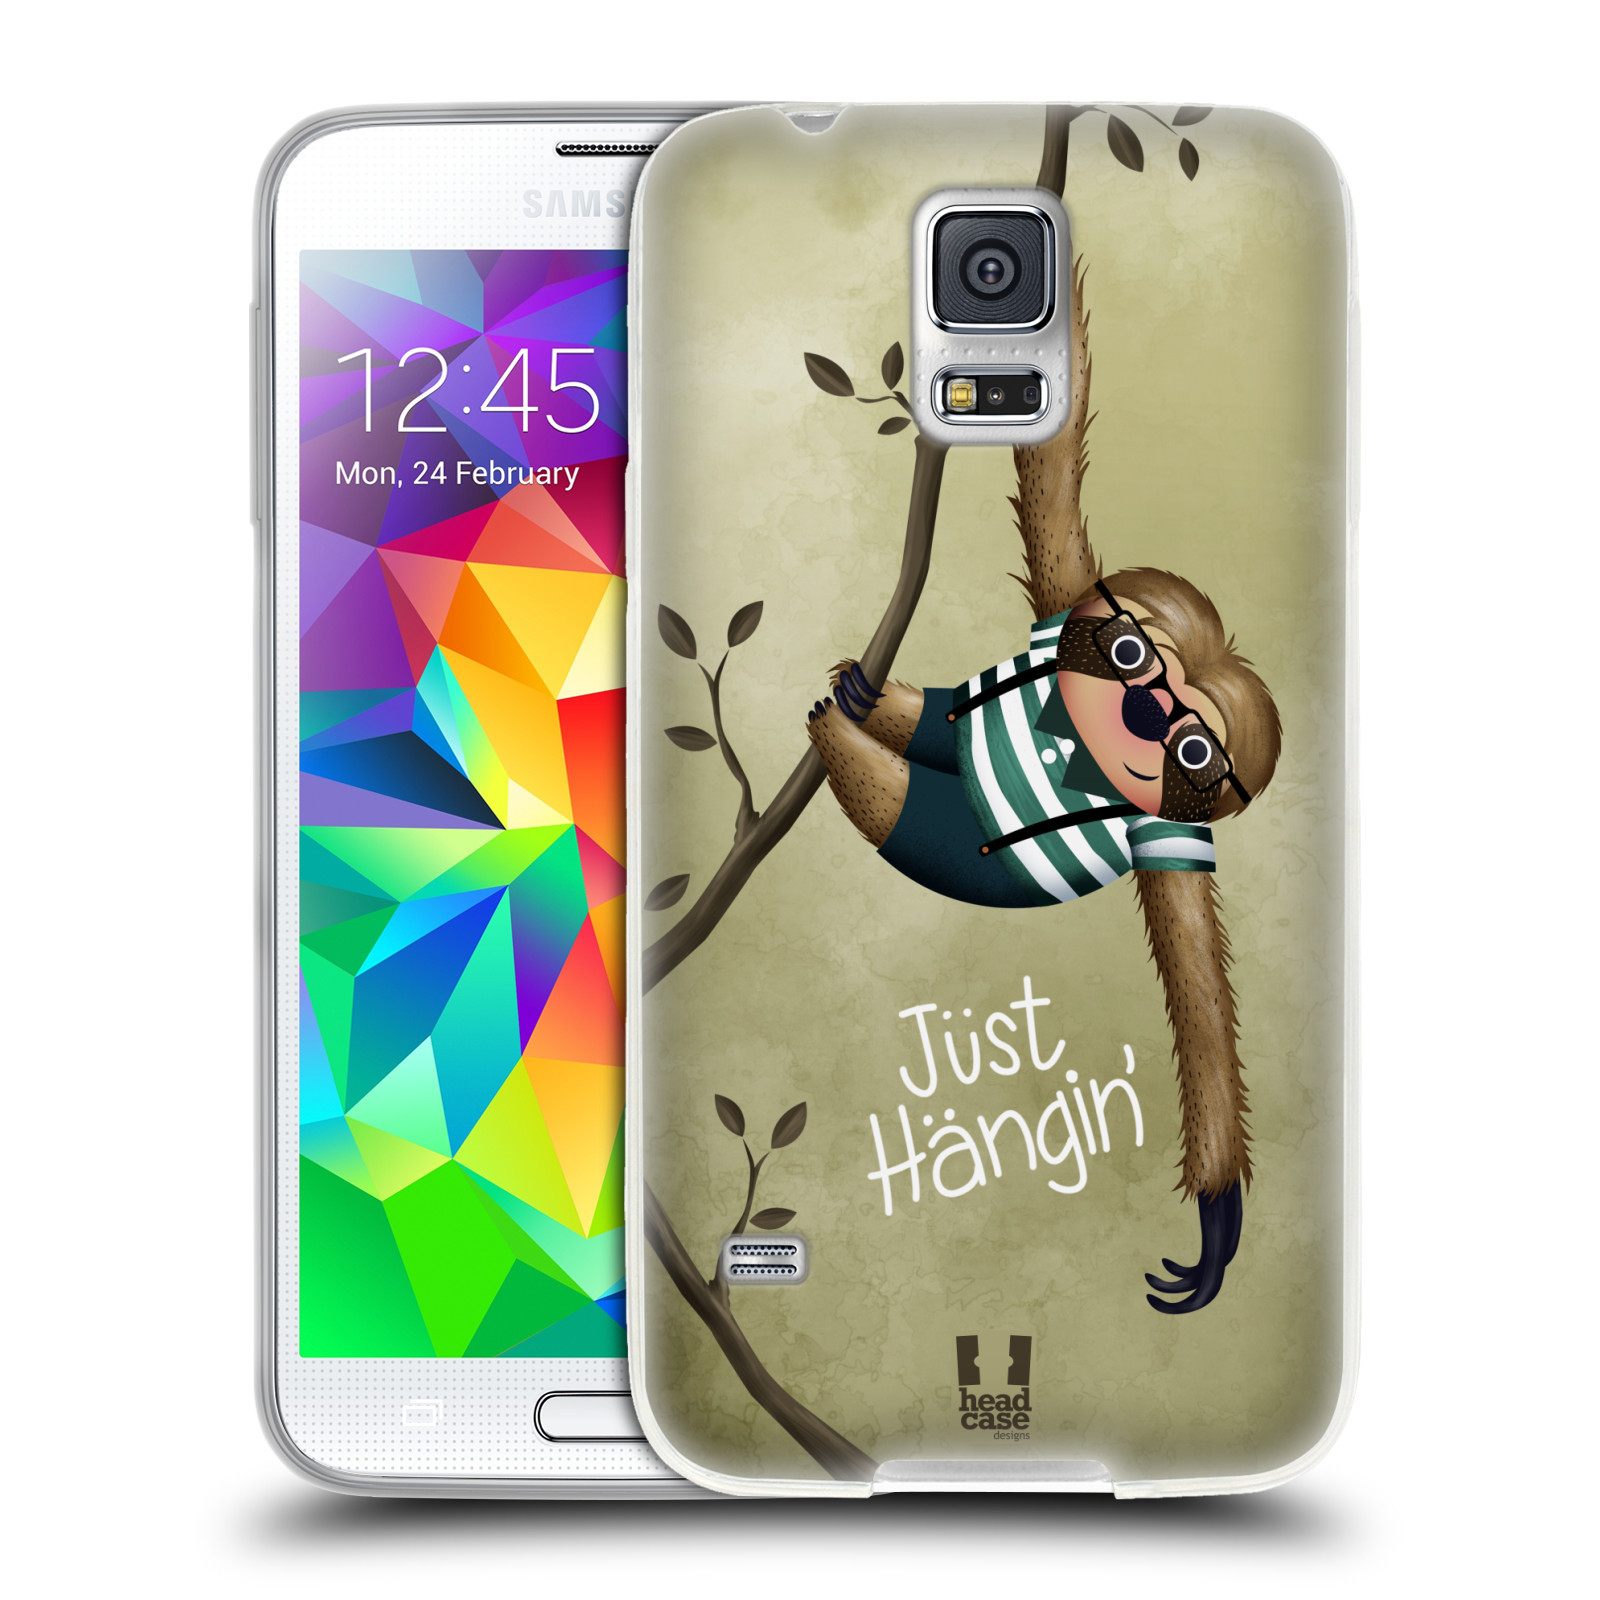 Silikonové pouzdro na mobil Samsung Galaxy S5 Neo HEAD CASE Lenochod Just Hangin